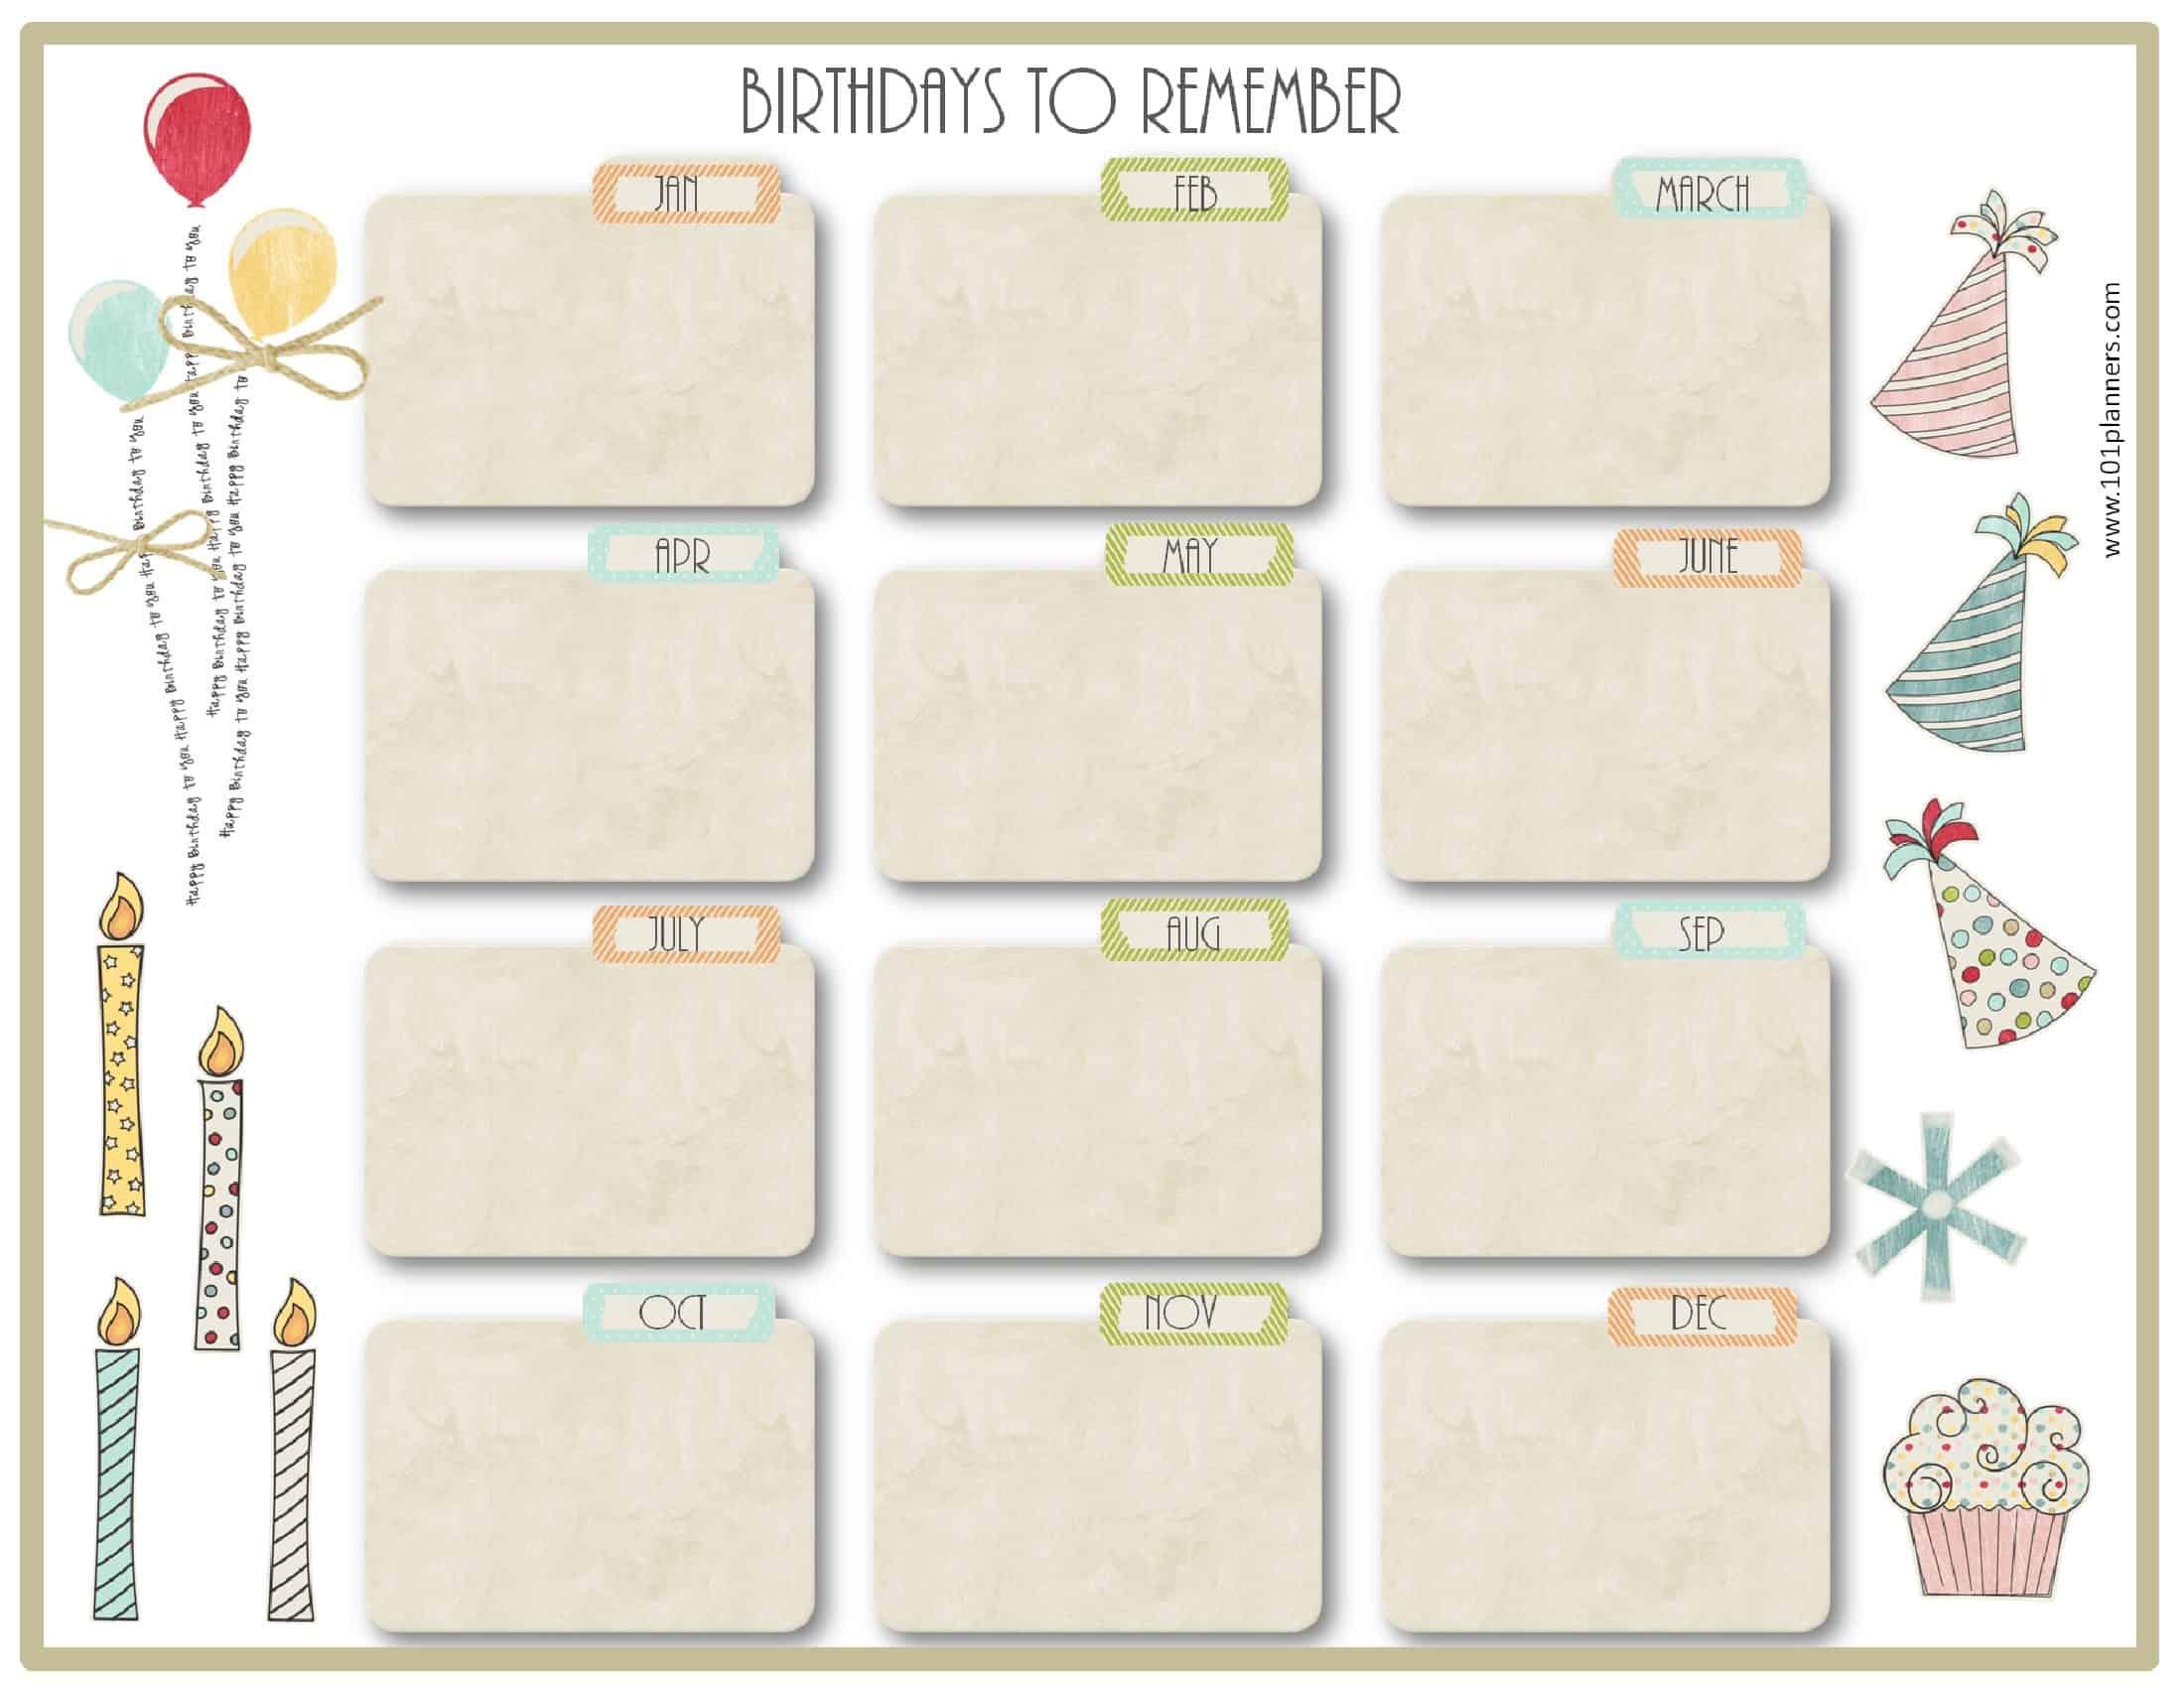 Free Birthday Calendar | Printable & Customizable | Many Designs! inside Blank Monthly Birthday Calendars